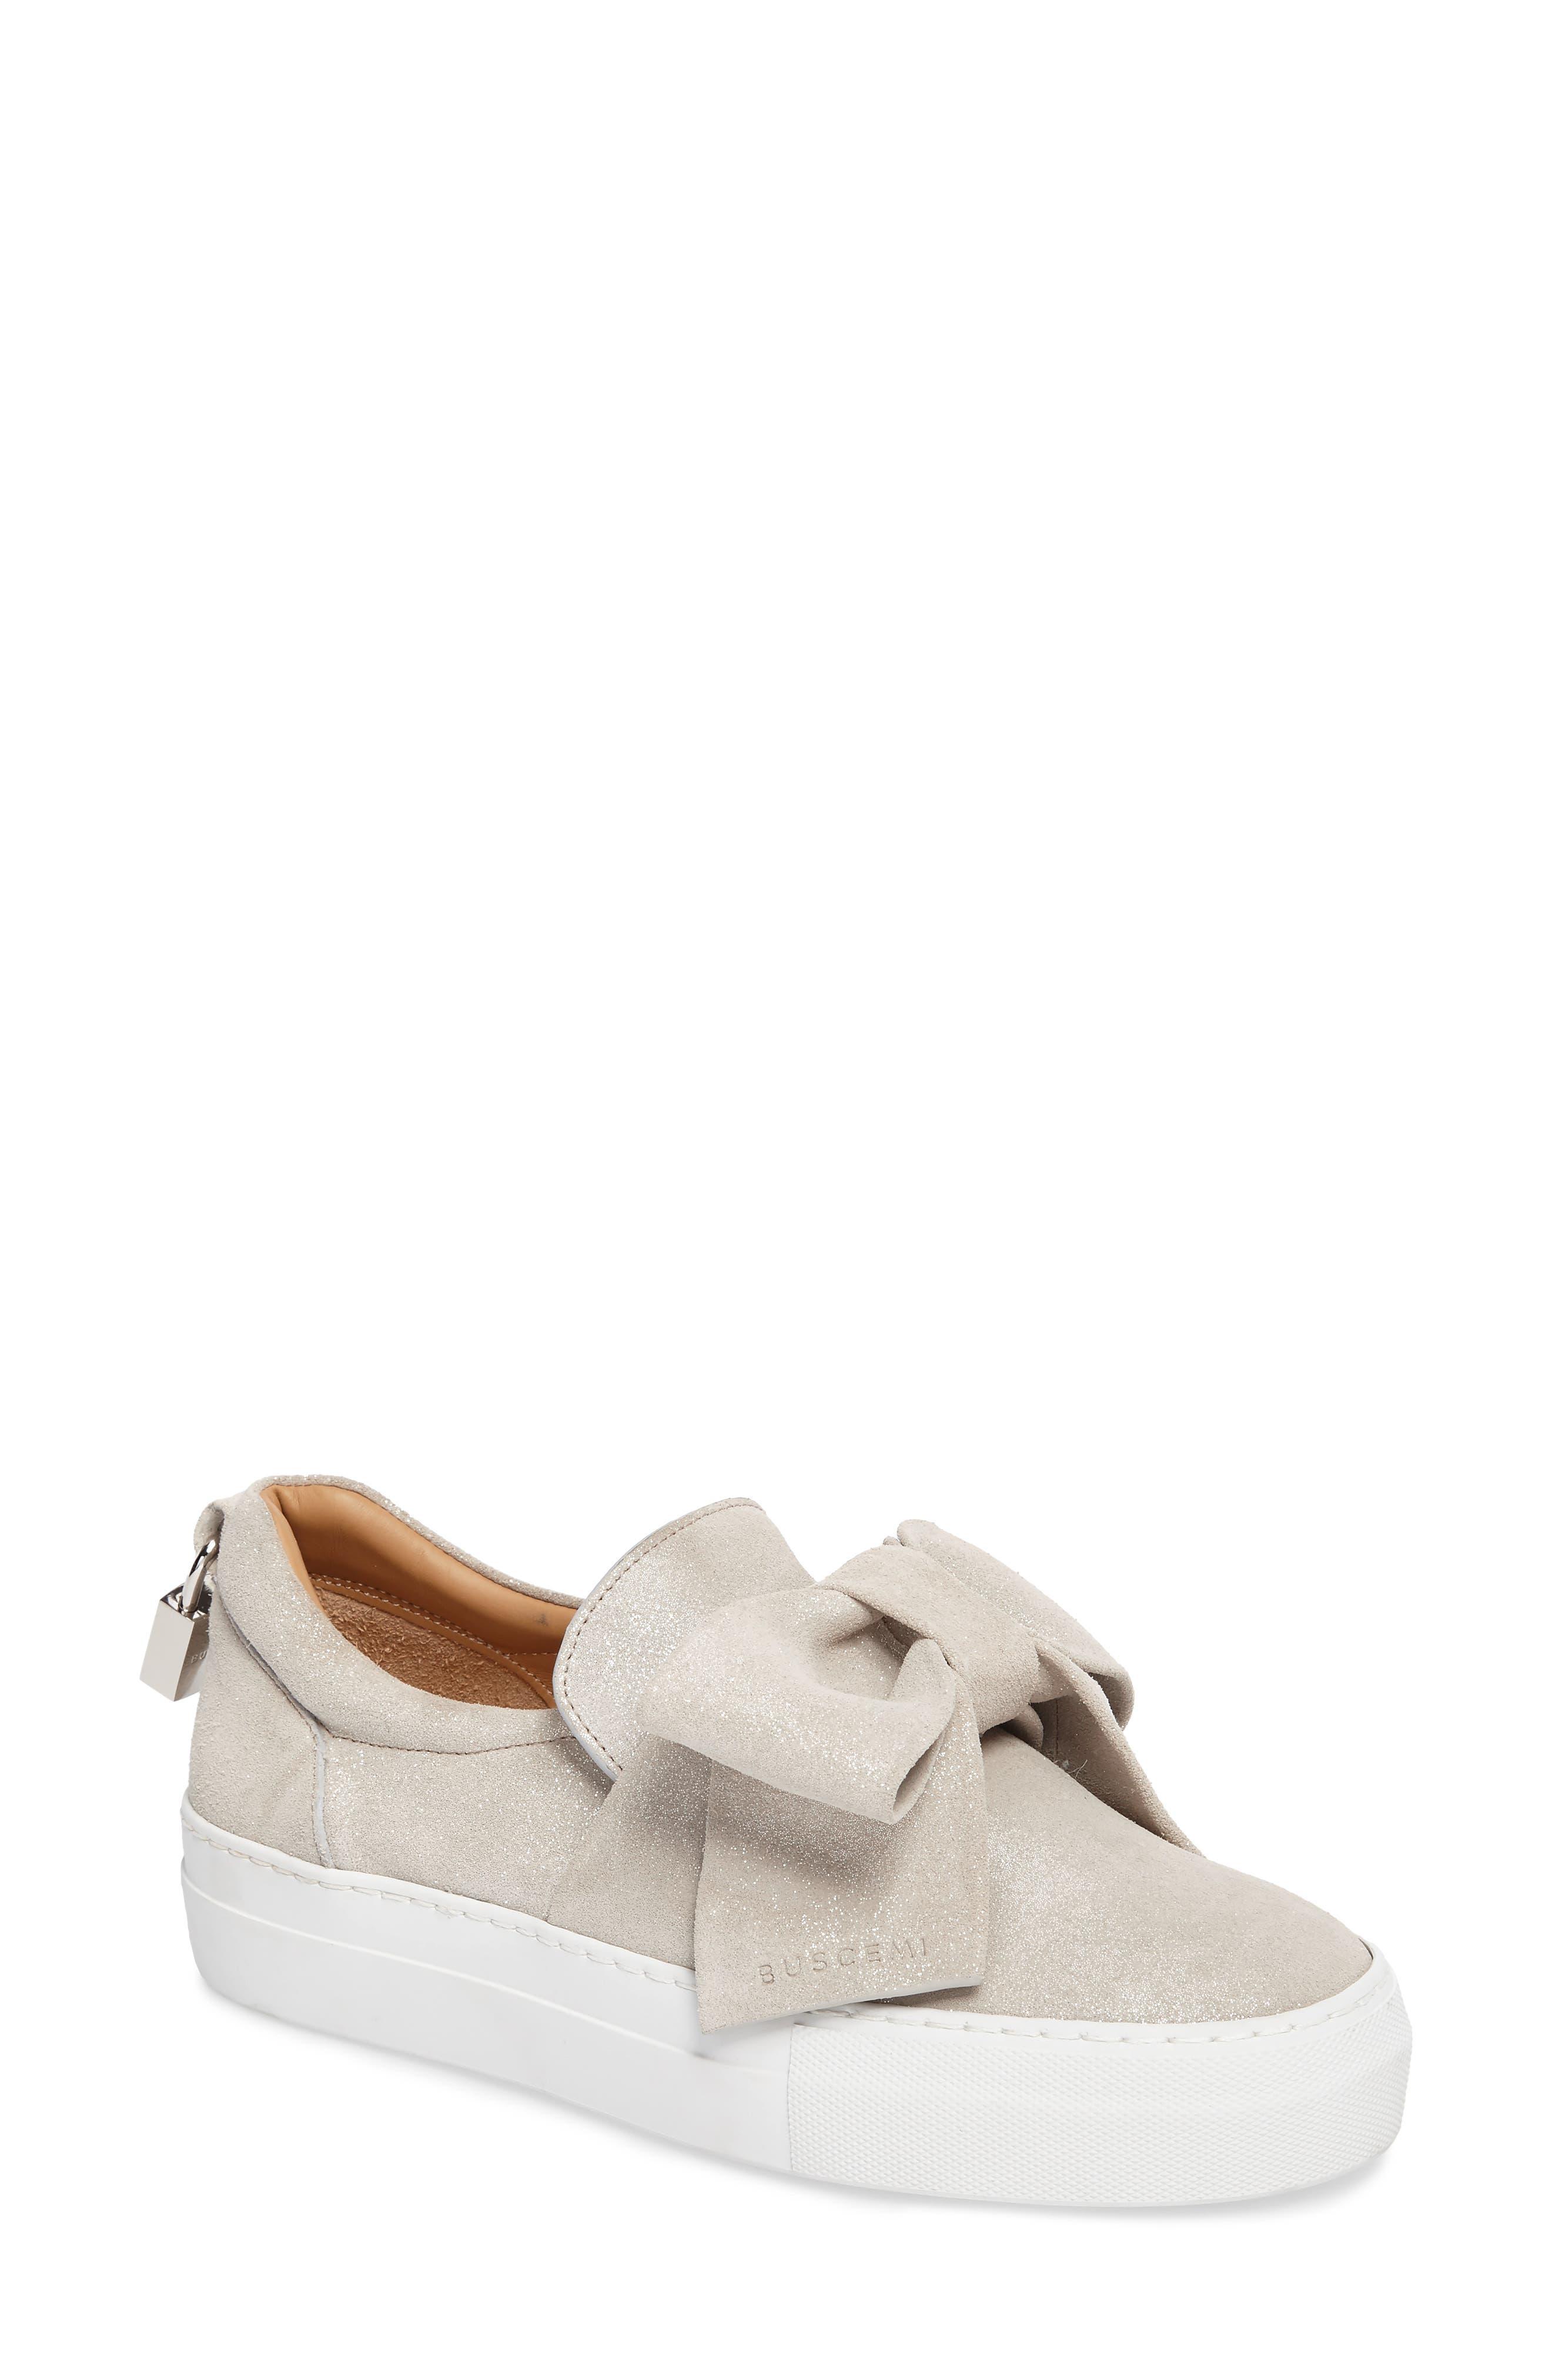 Bow Slip-On Sneaker,                         Main,                         color, Gleam Grey